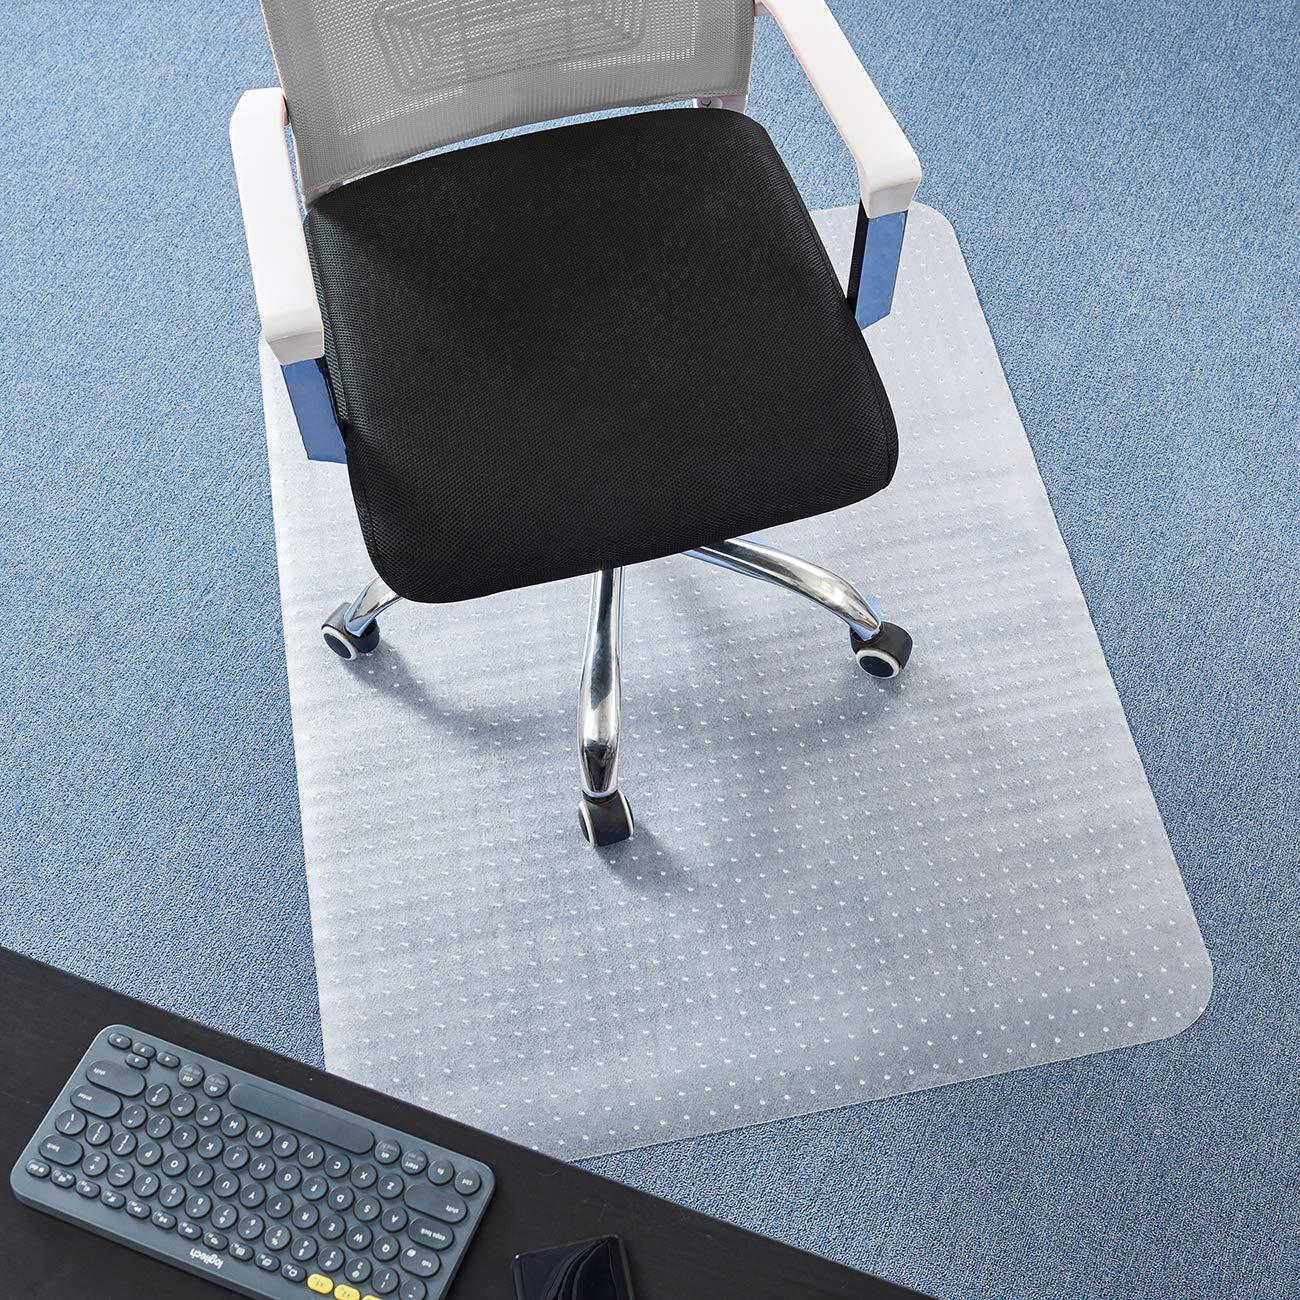 DAVID.ANN 36'' x 48'' Vinyl (PVC) Rectangular Chair Mat for Very Low Pile Carpets (Transparent)